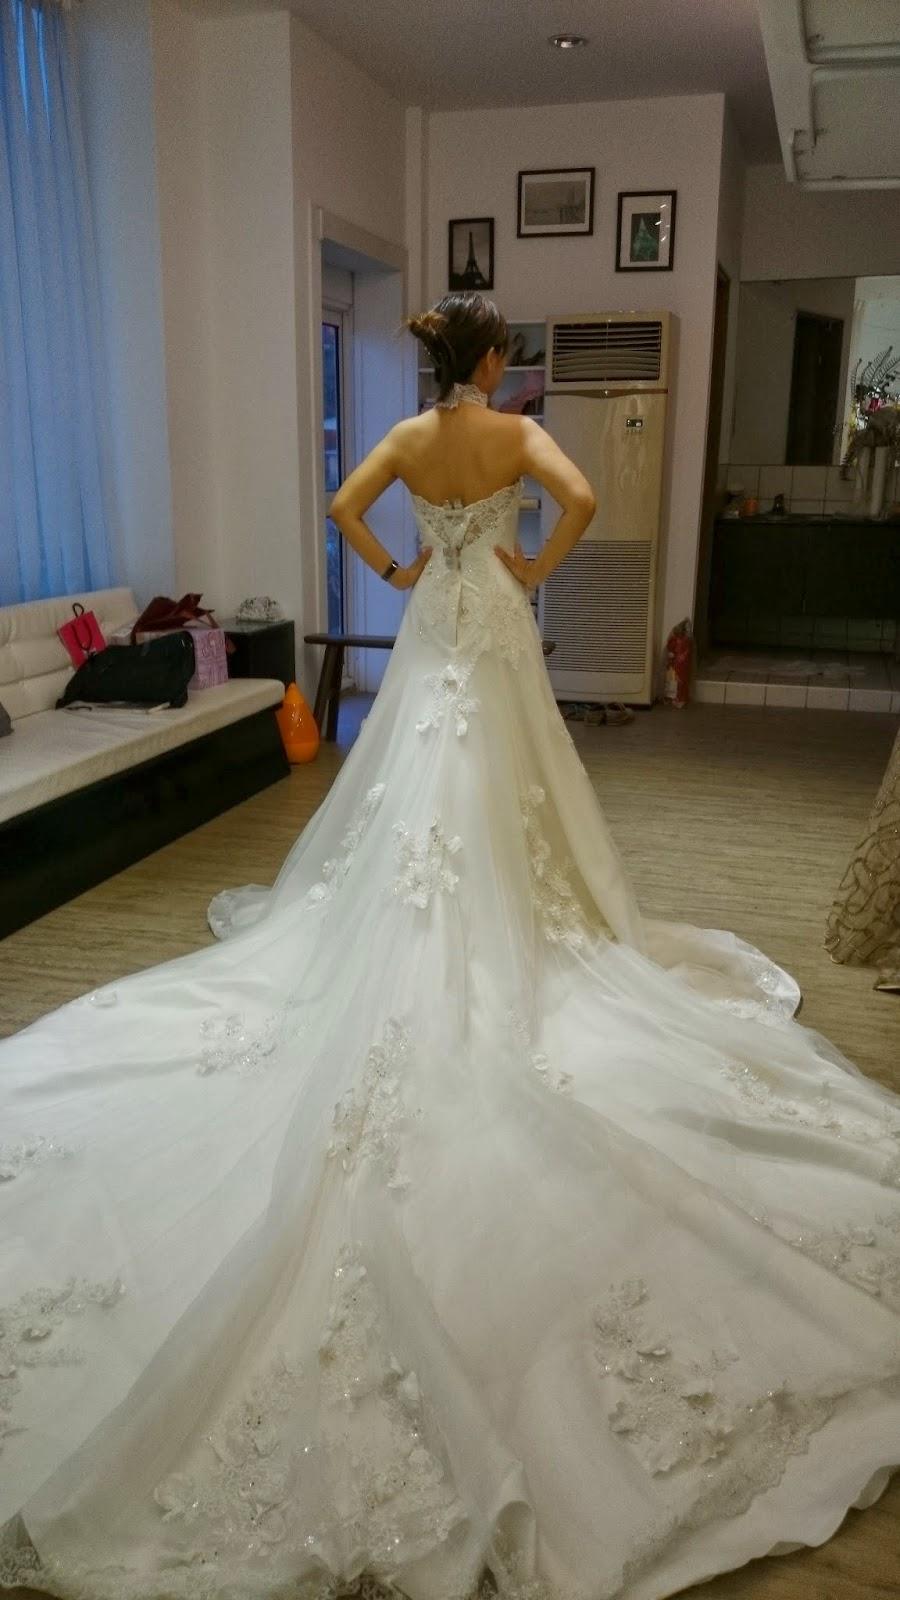 Joanne Hwang 教學宅急便: 【Wedding。挑宴客婚紗】